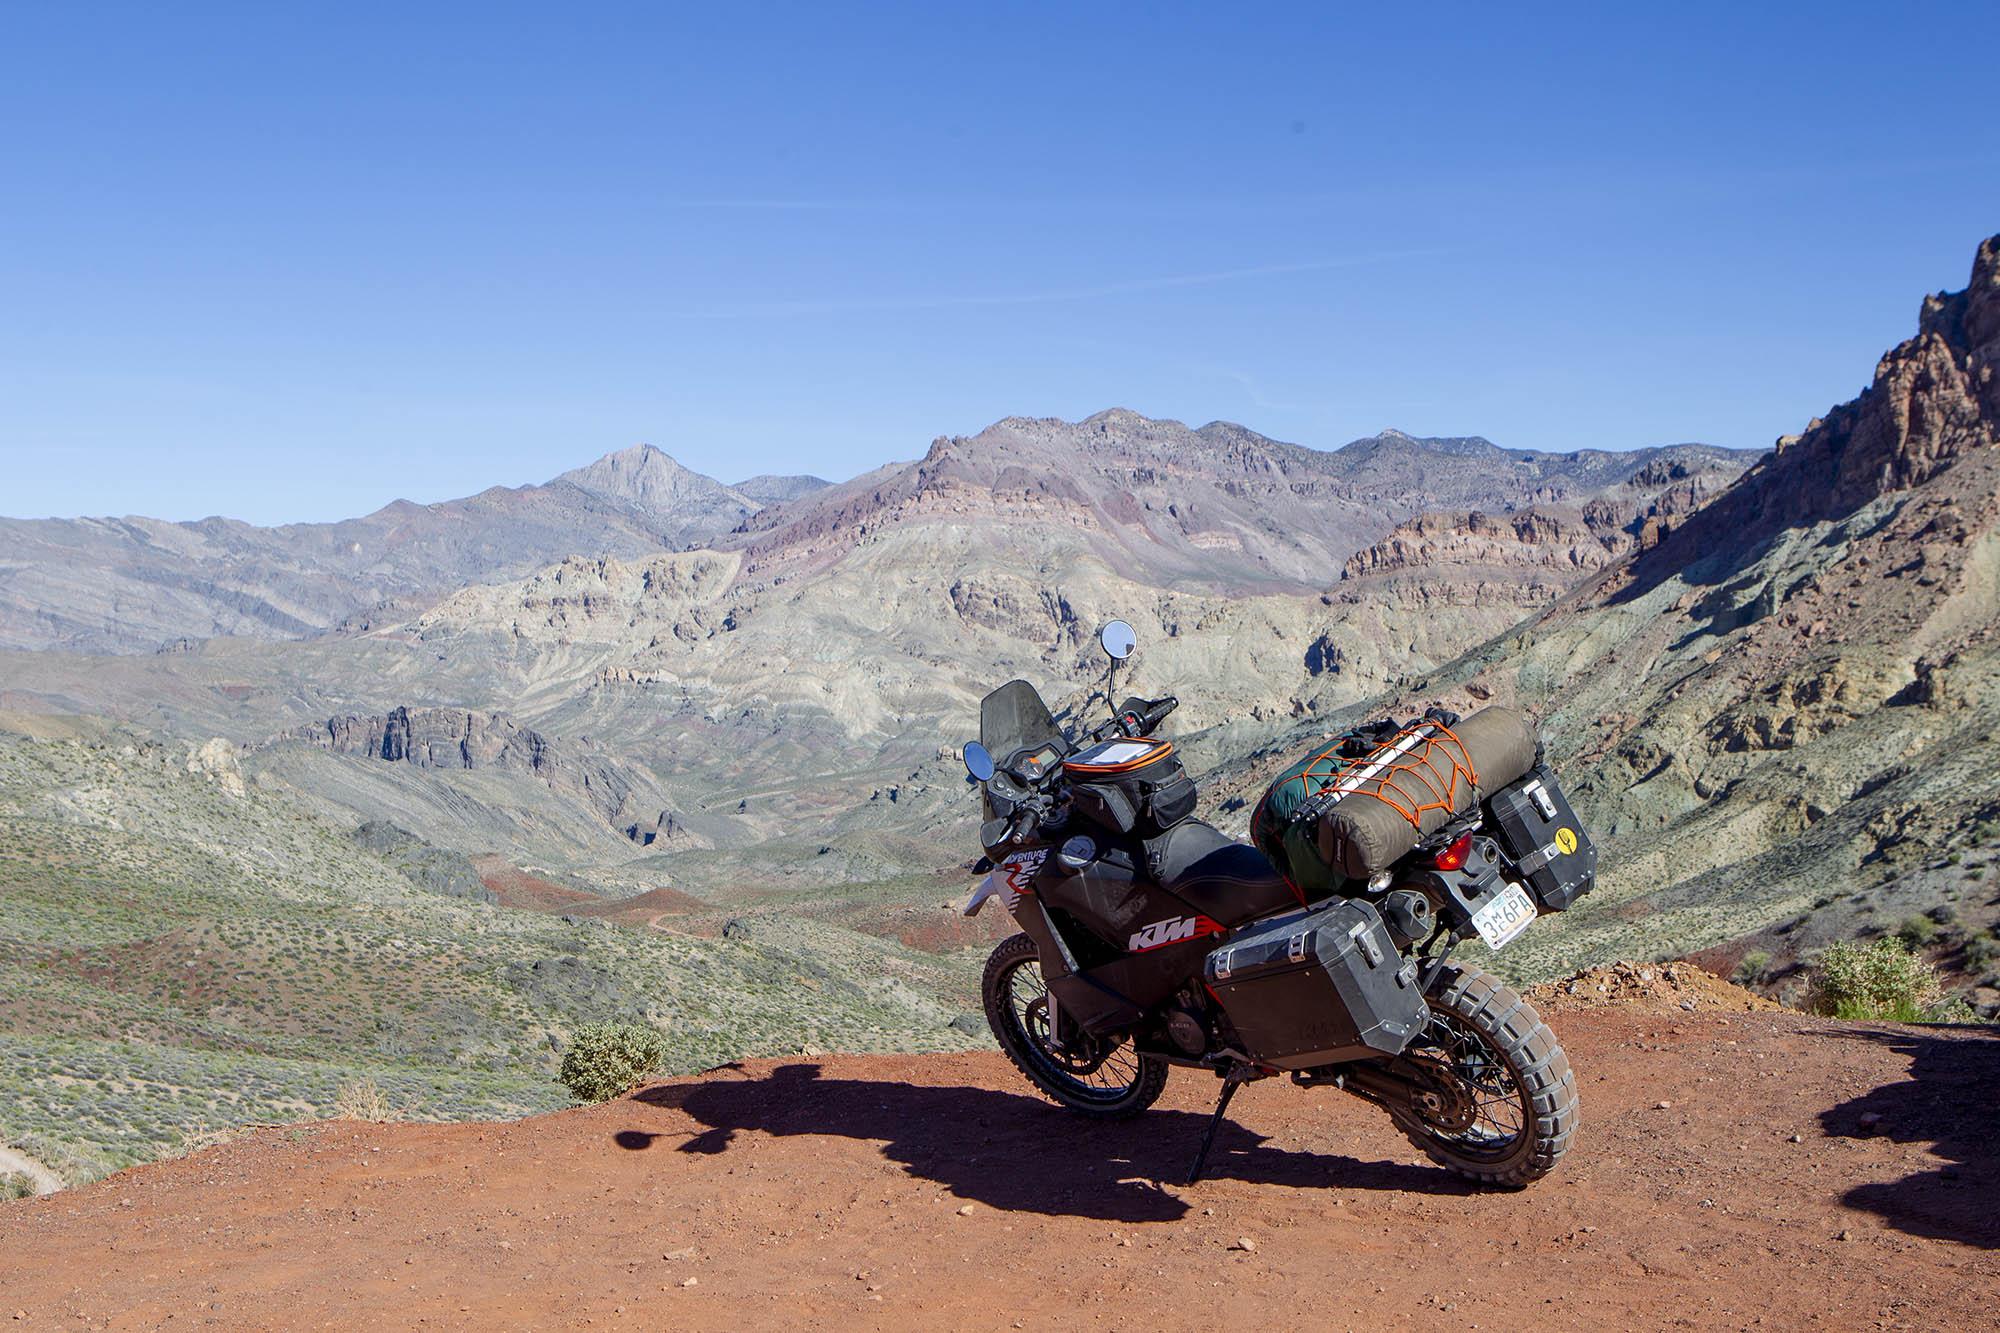 IMG_4354-ADV rider.jpg